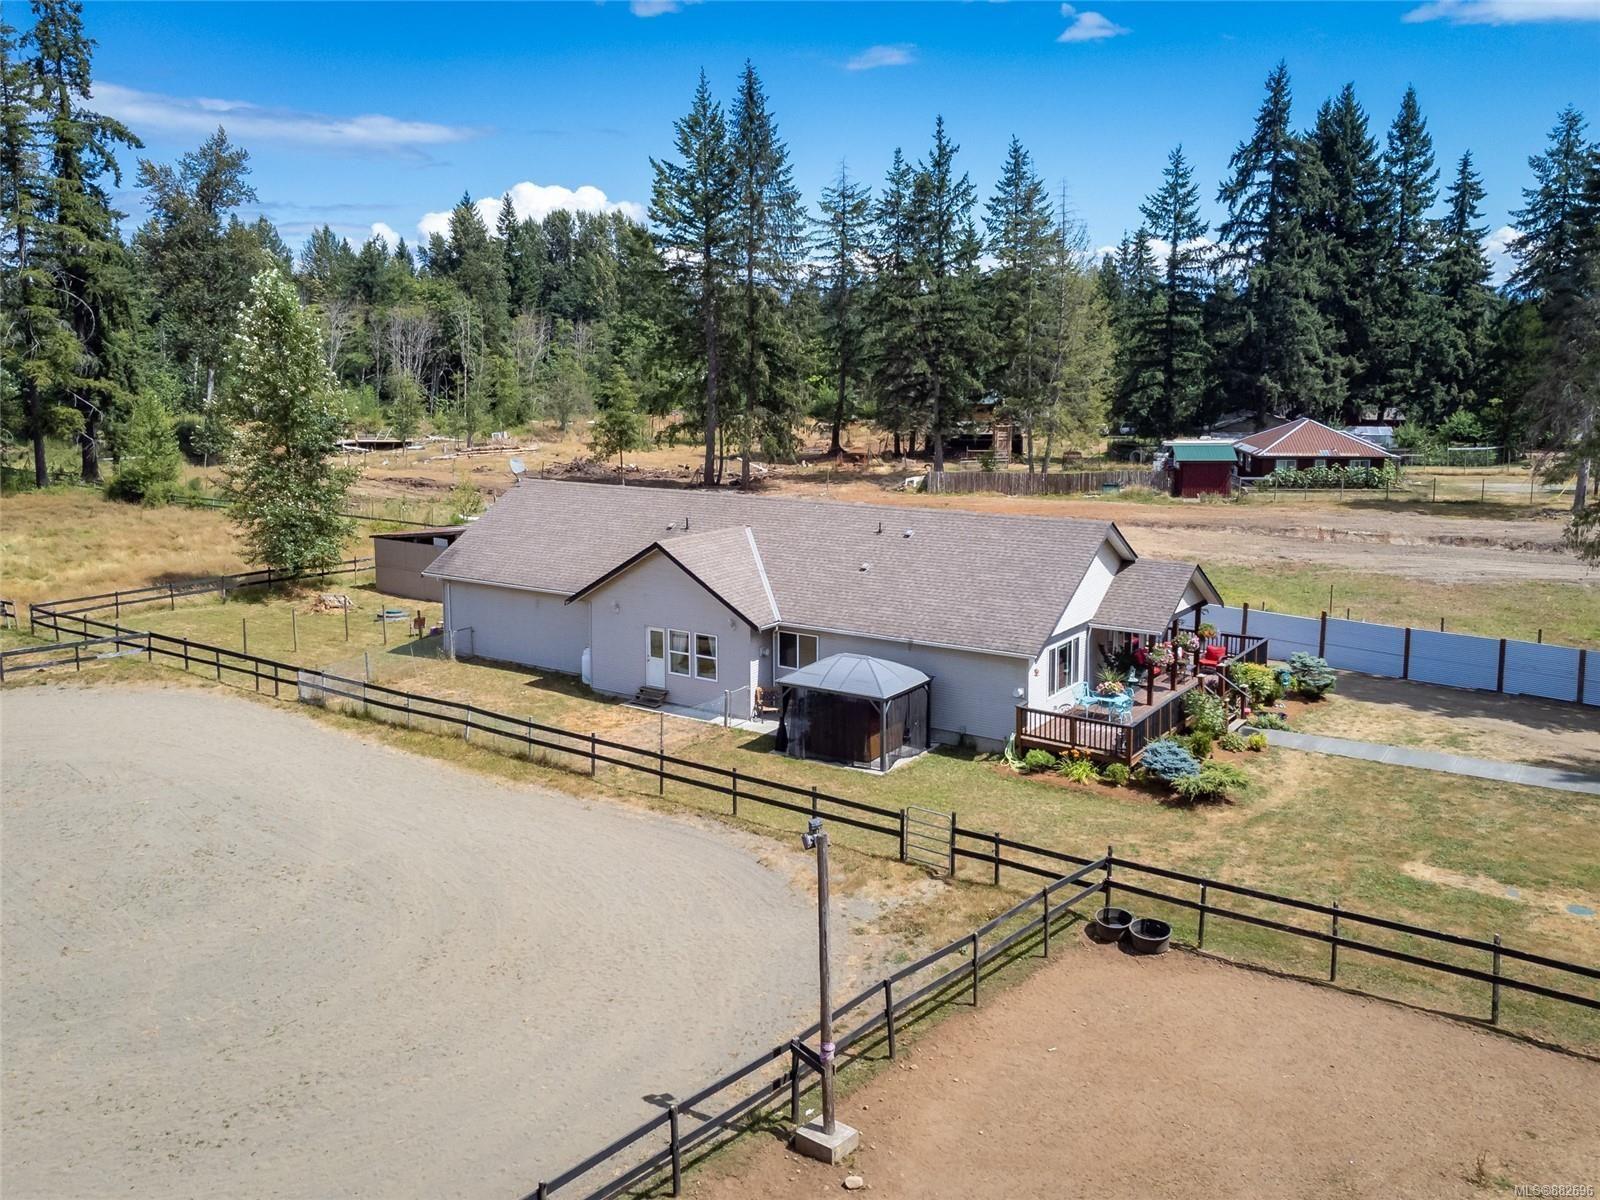 Photo 38: Photos: 3554 MacAulay Rd in : CV Merville Black Creek House for sale (Comox Valley)  : MLS®# 882696